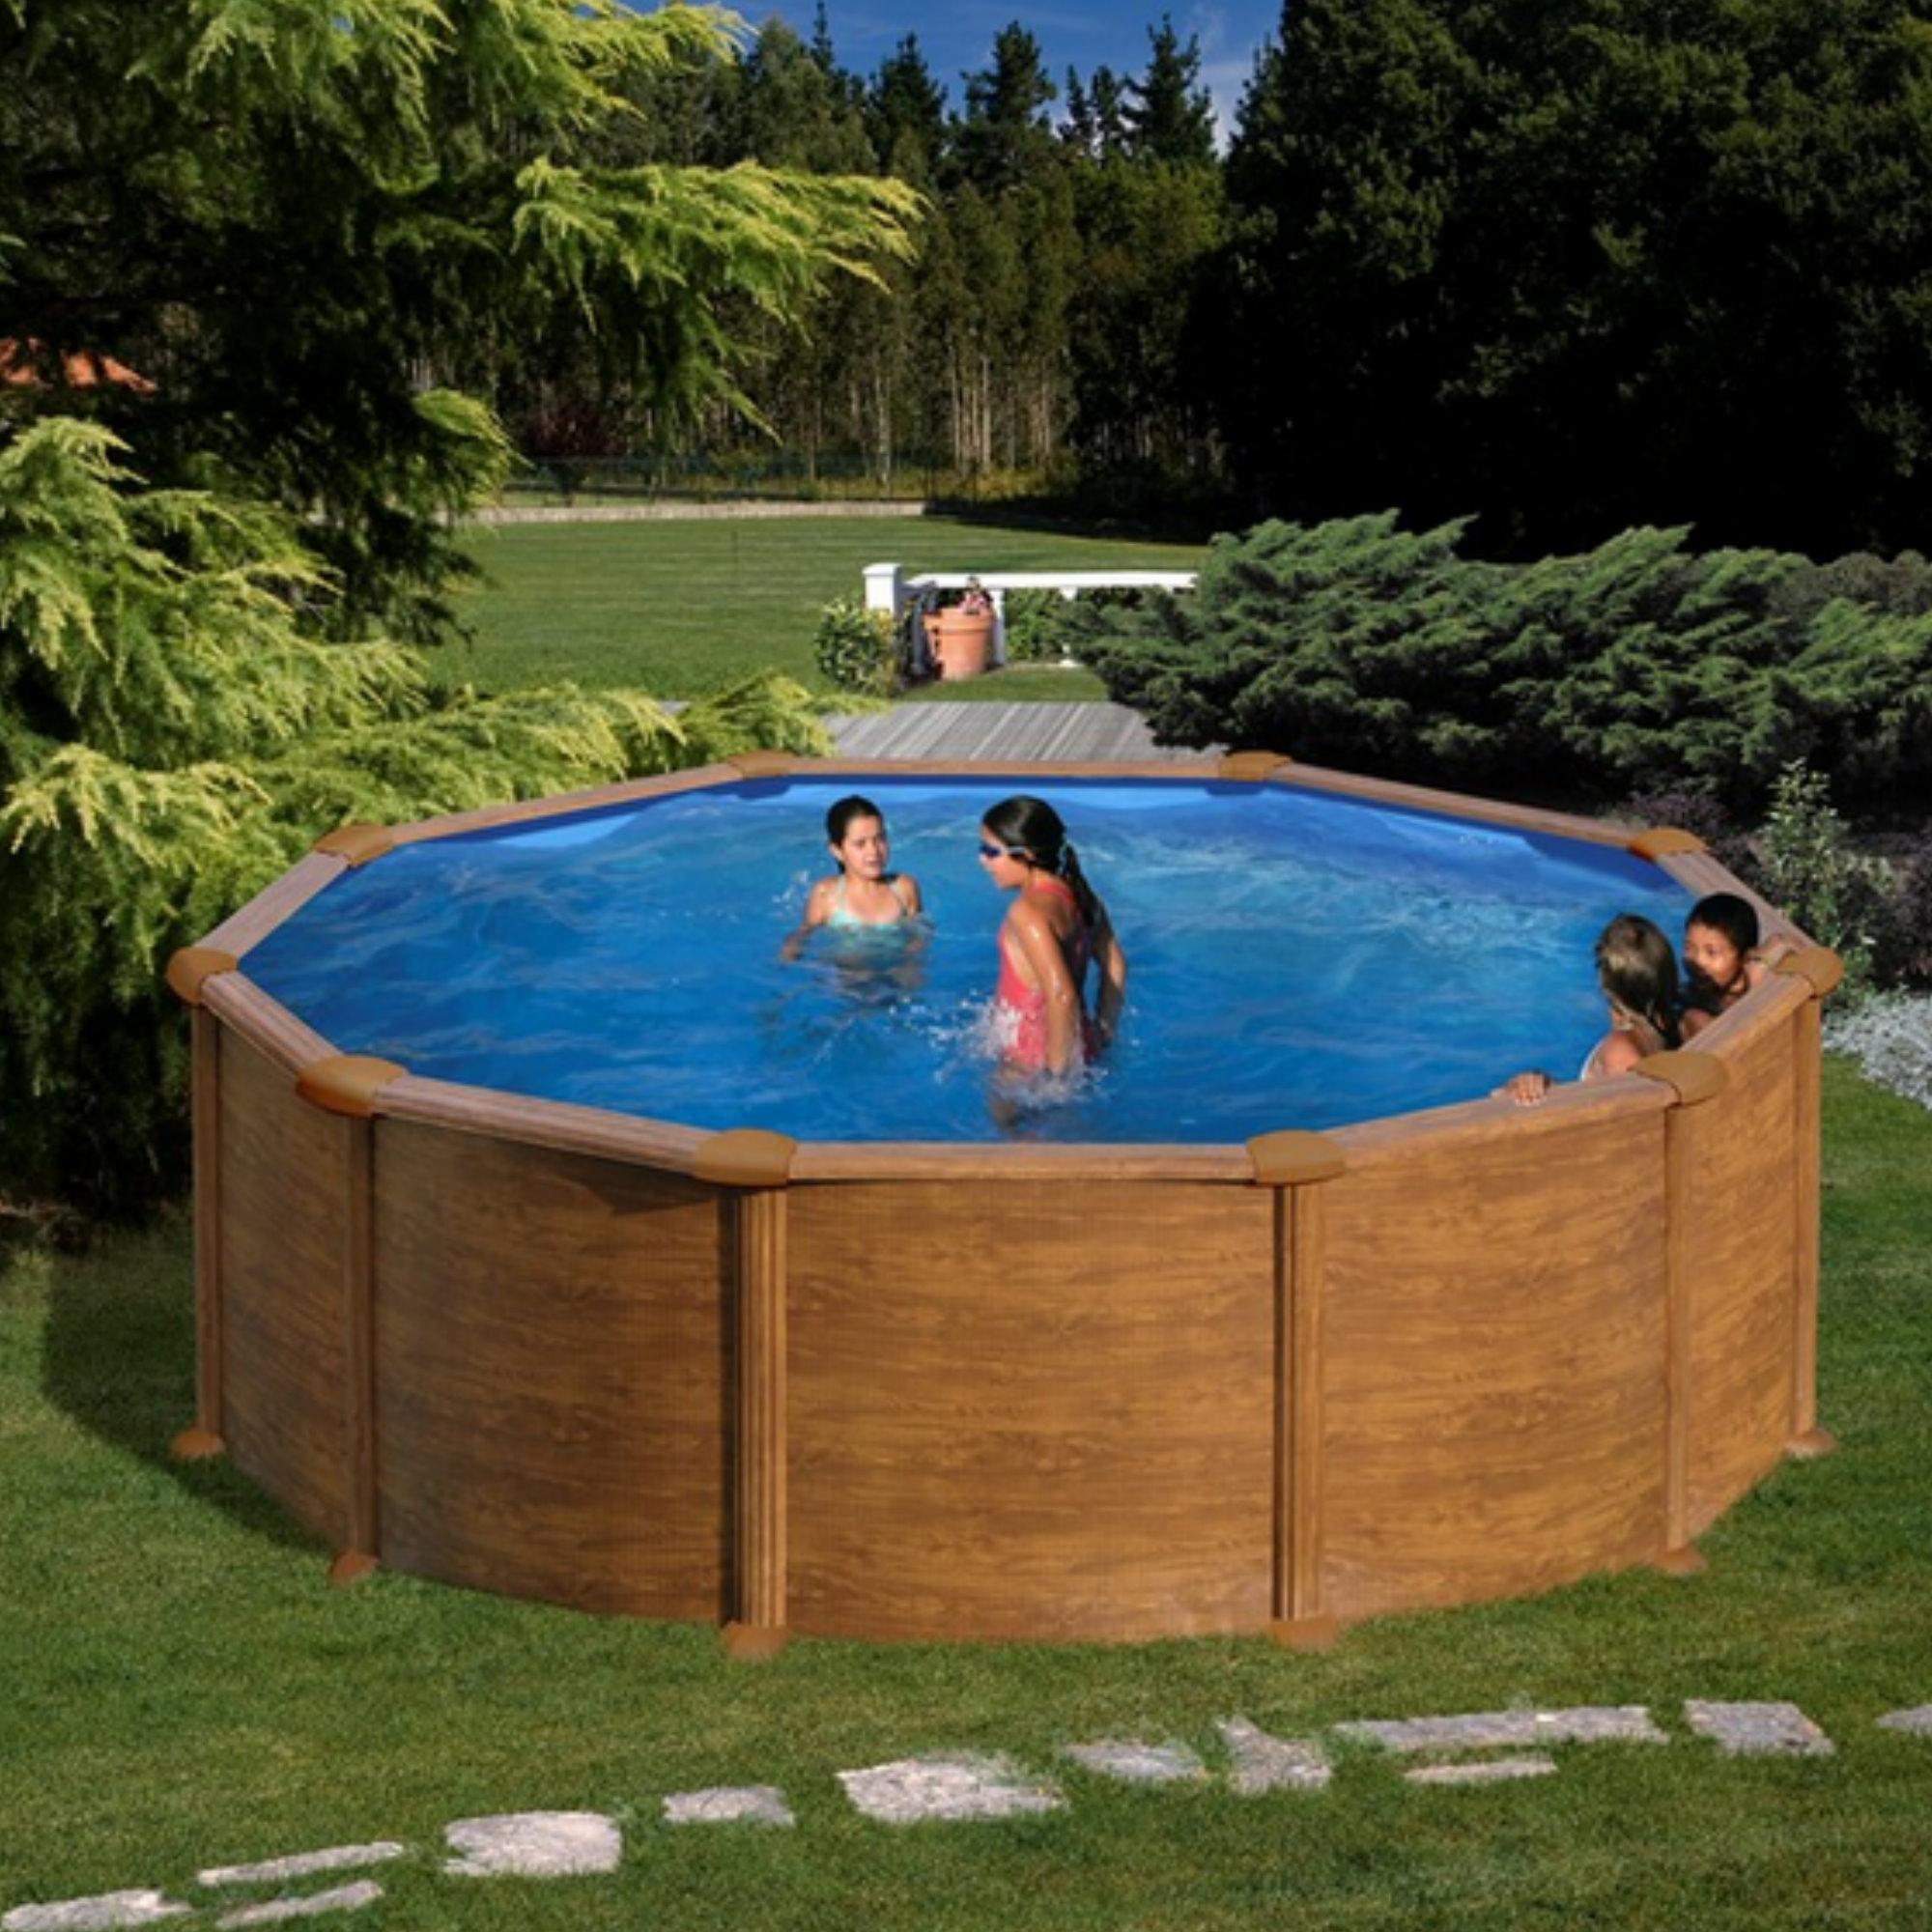 Rundformbeckenset holzoptik calapagos 240 cm x 120 cm for Pool 120 cm tief